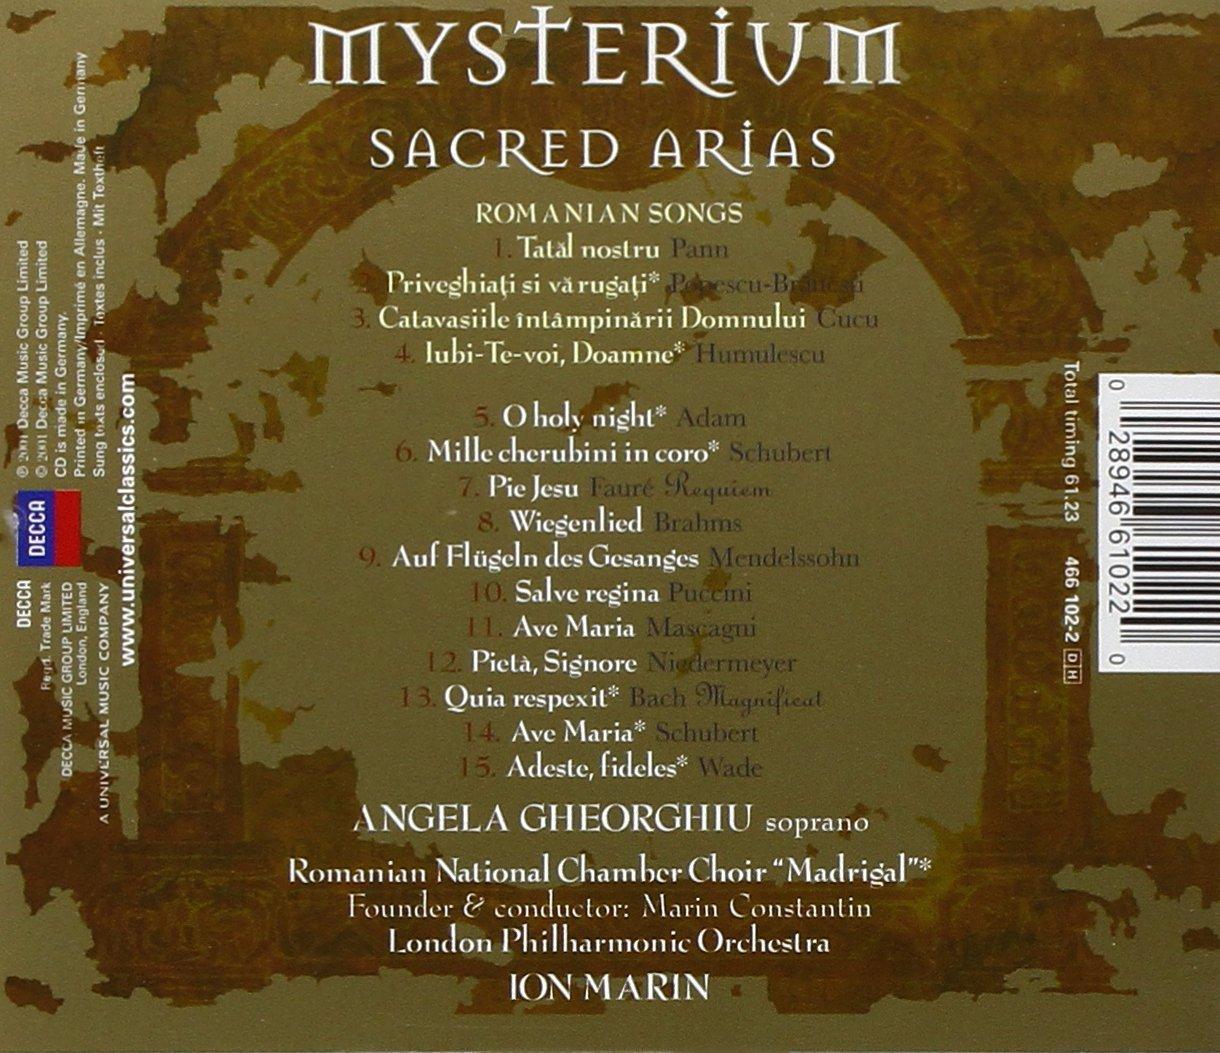 Angela Gheorghiu - Mysterium ~ Sacred Arias by DECCA IMPORT